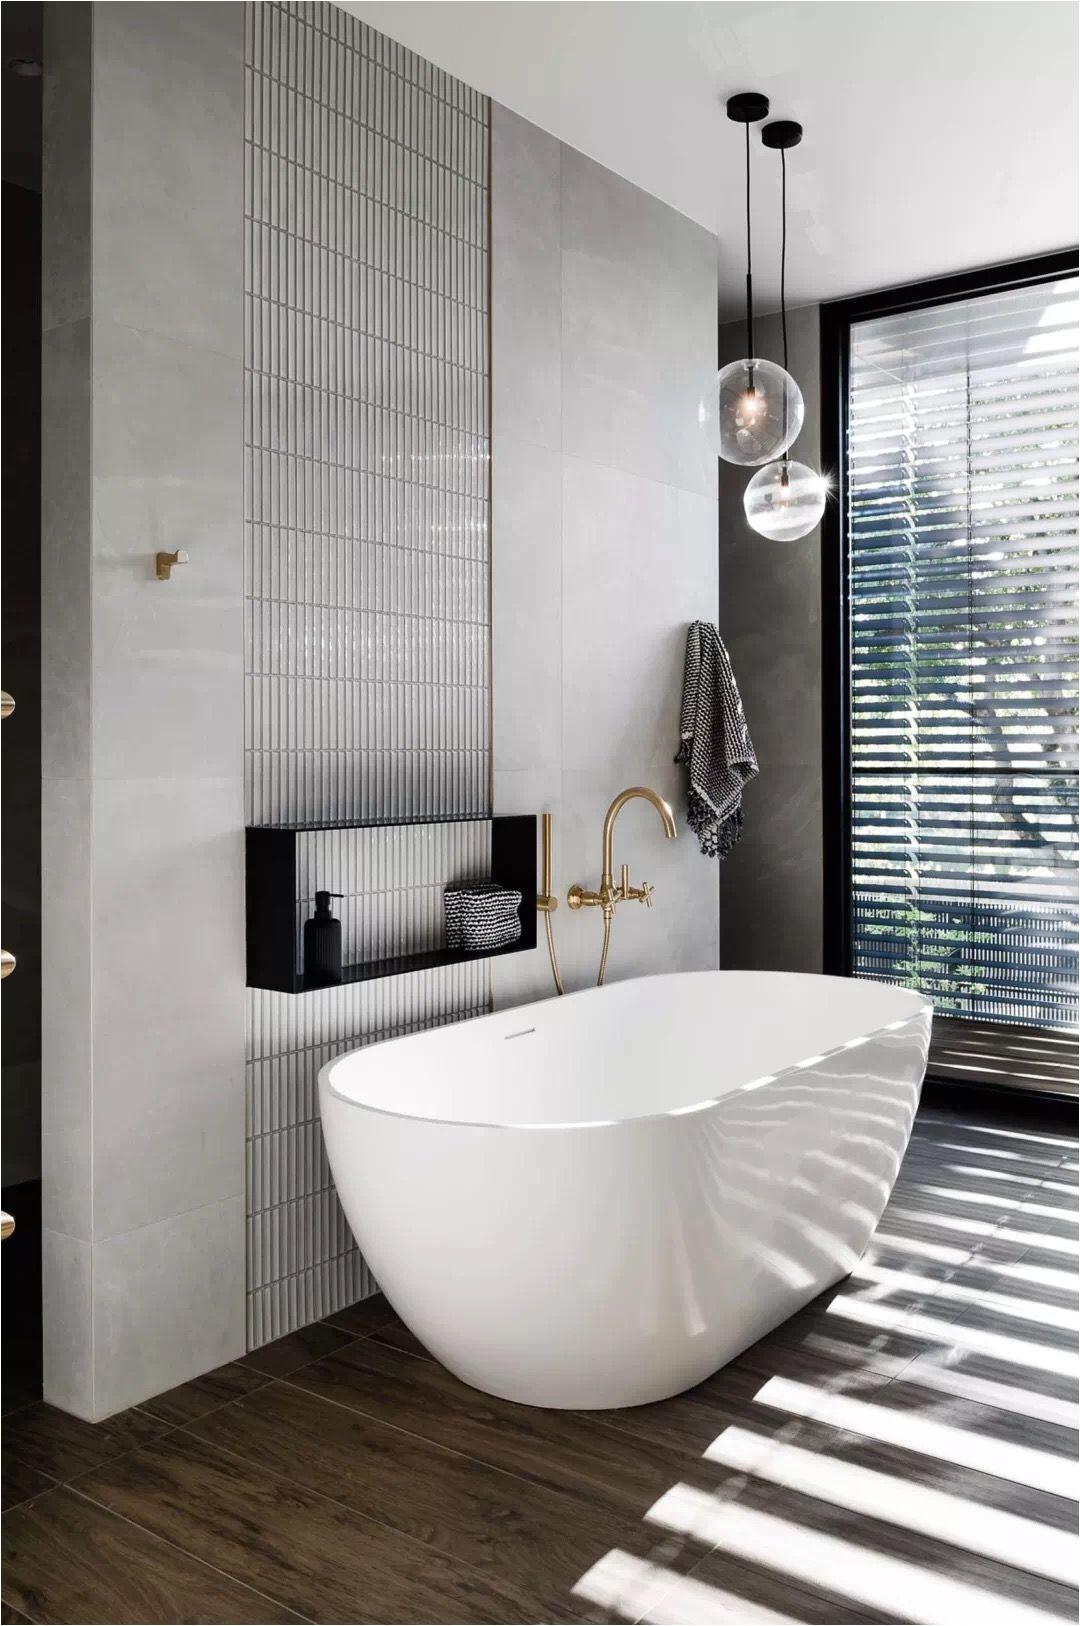 Australian Bathroom Design Ideas Cocoon Golden Bathroom Taps Inspiration